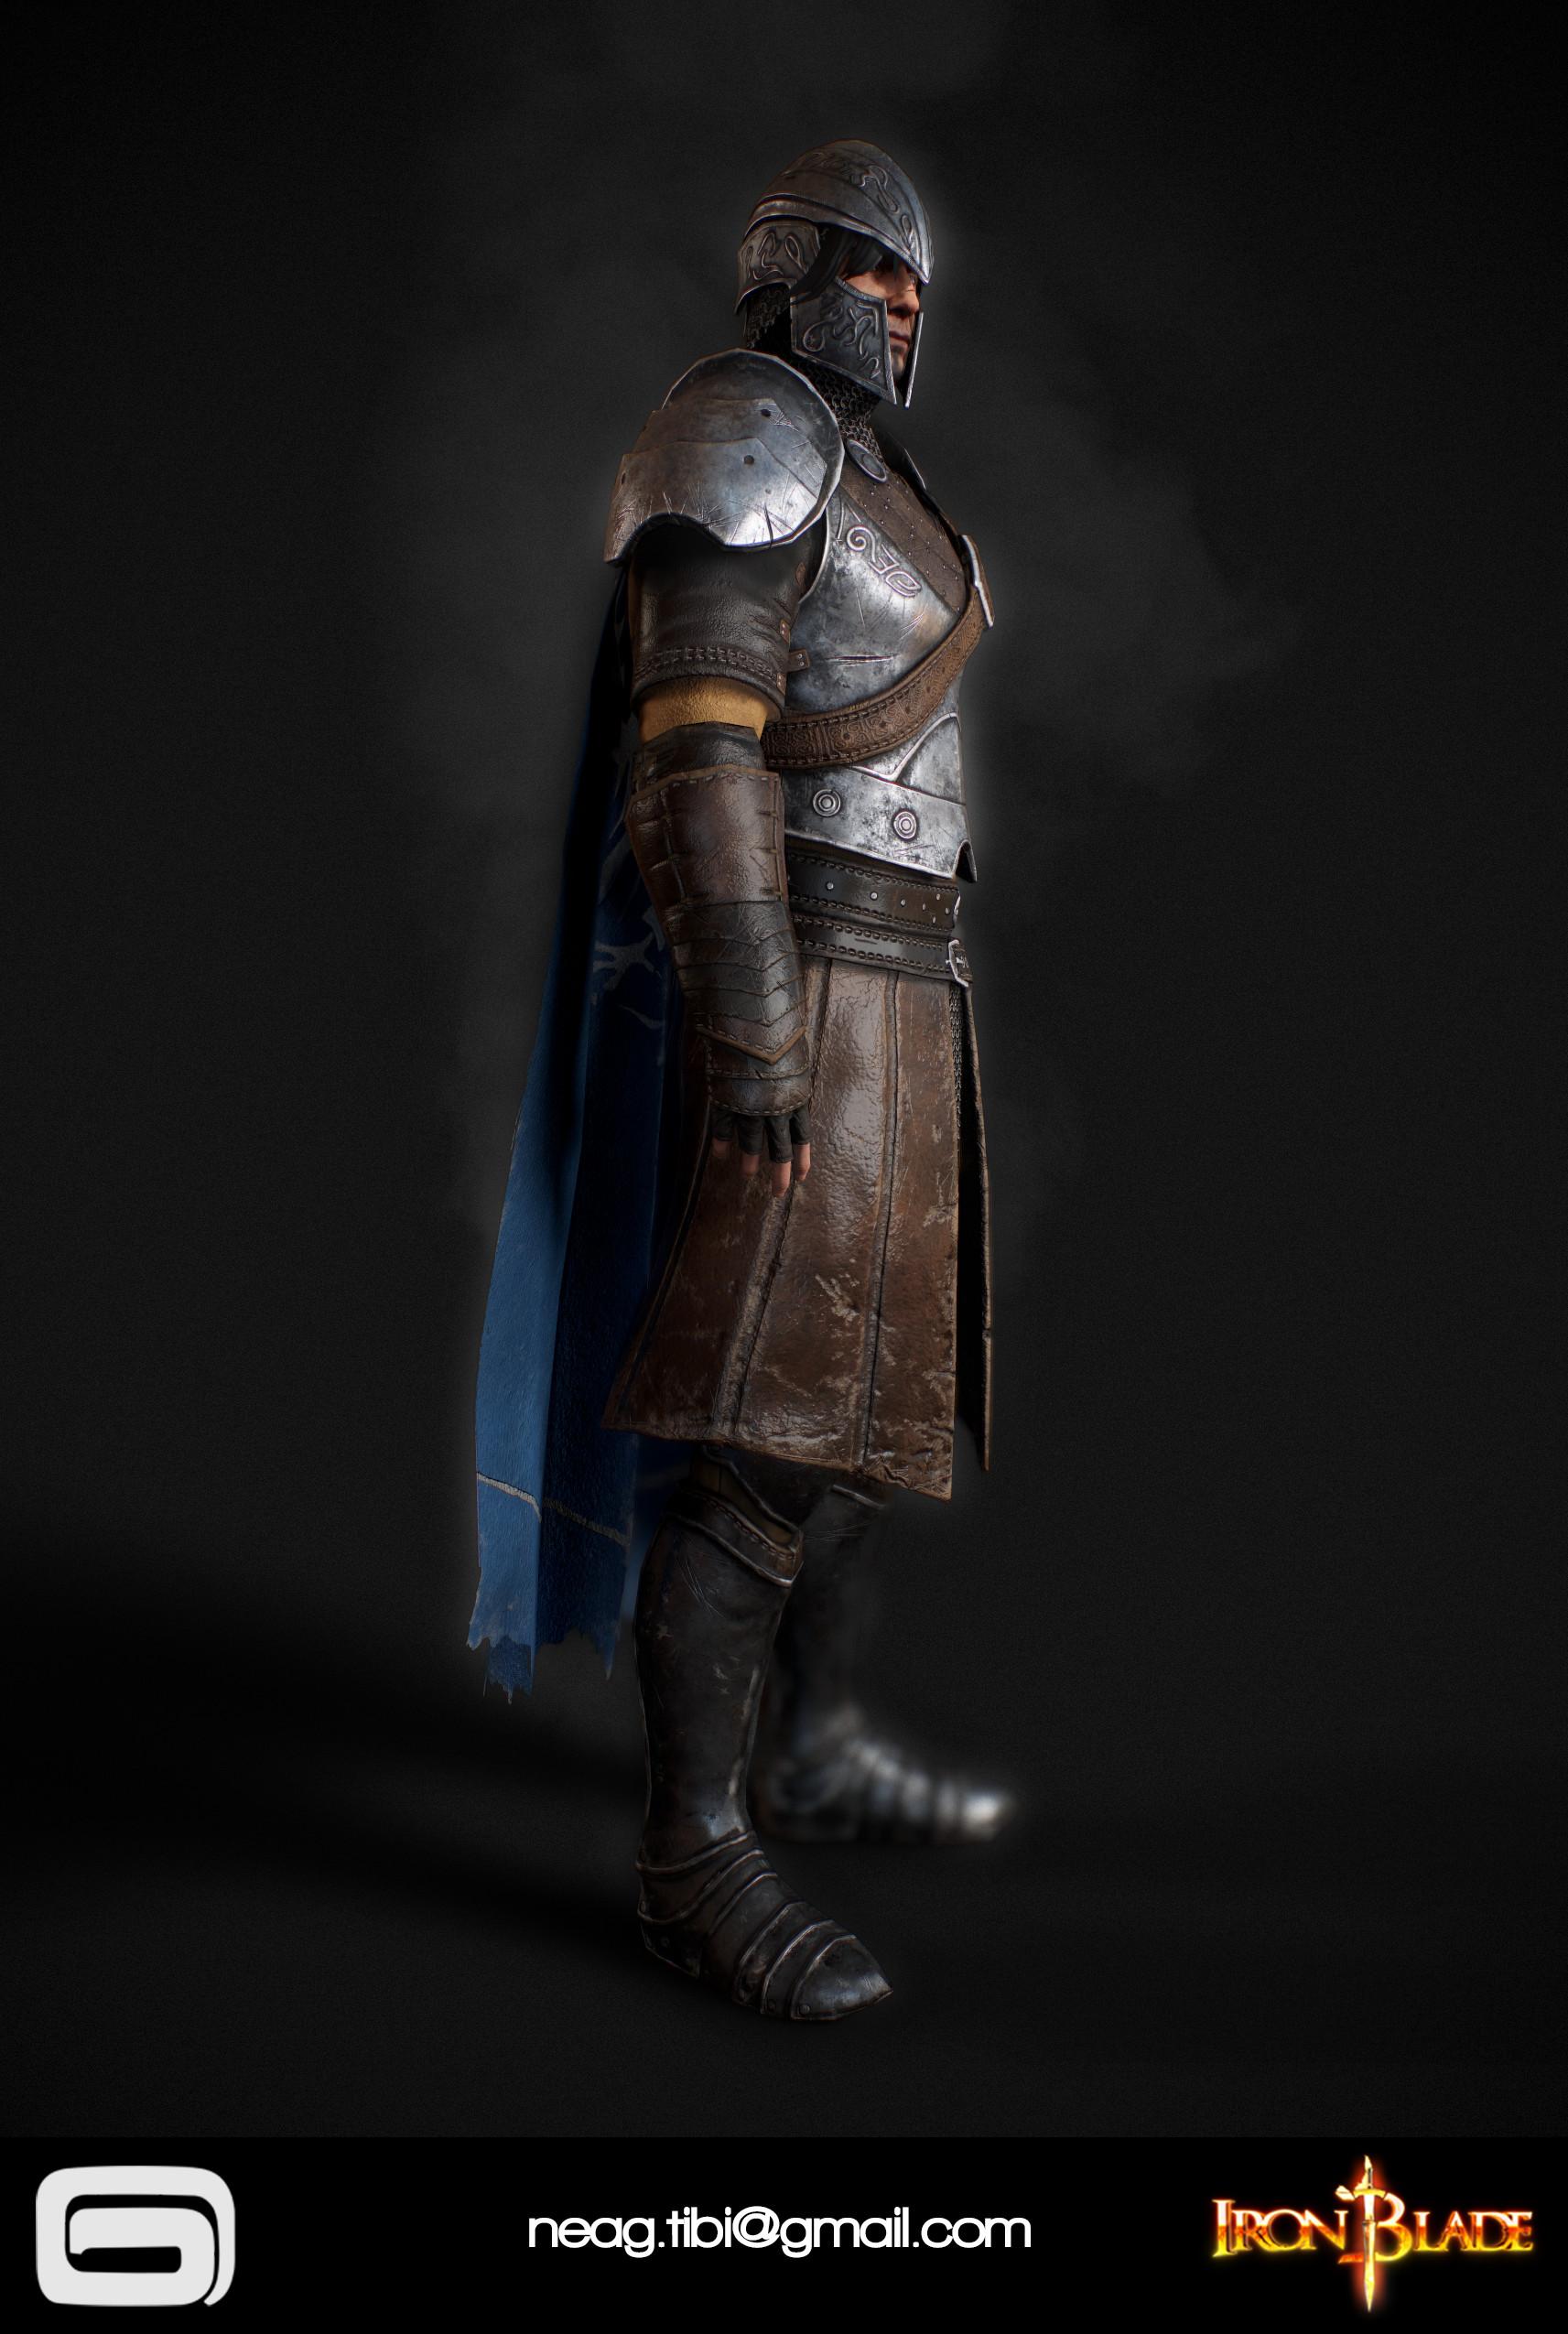 Tibi neag tibi neag iron blade mc armor 09b low poly 06